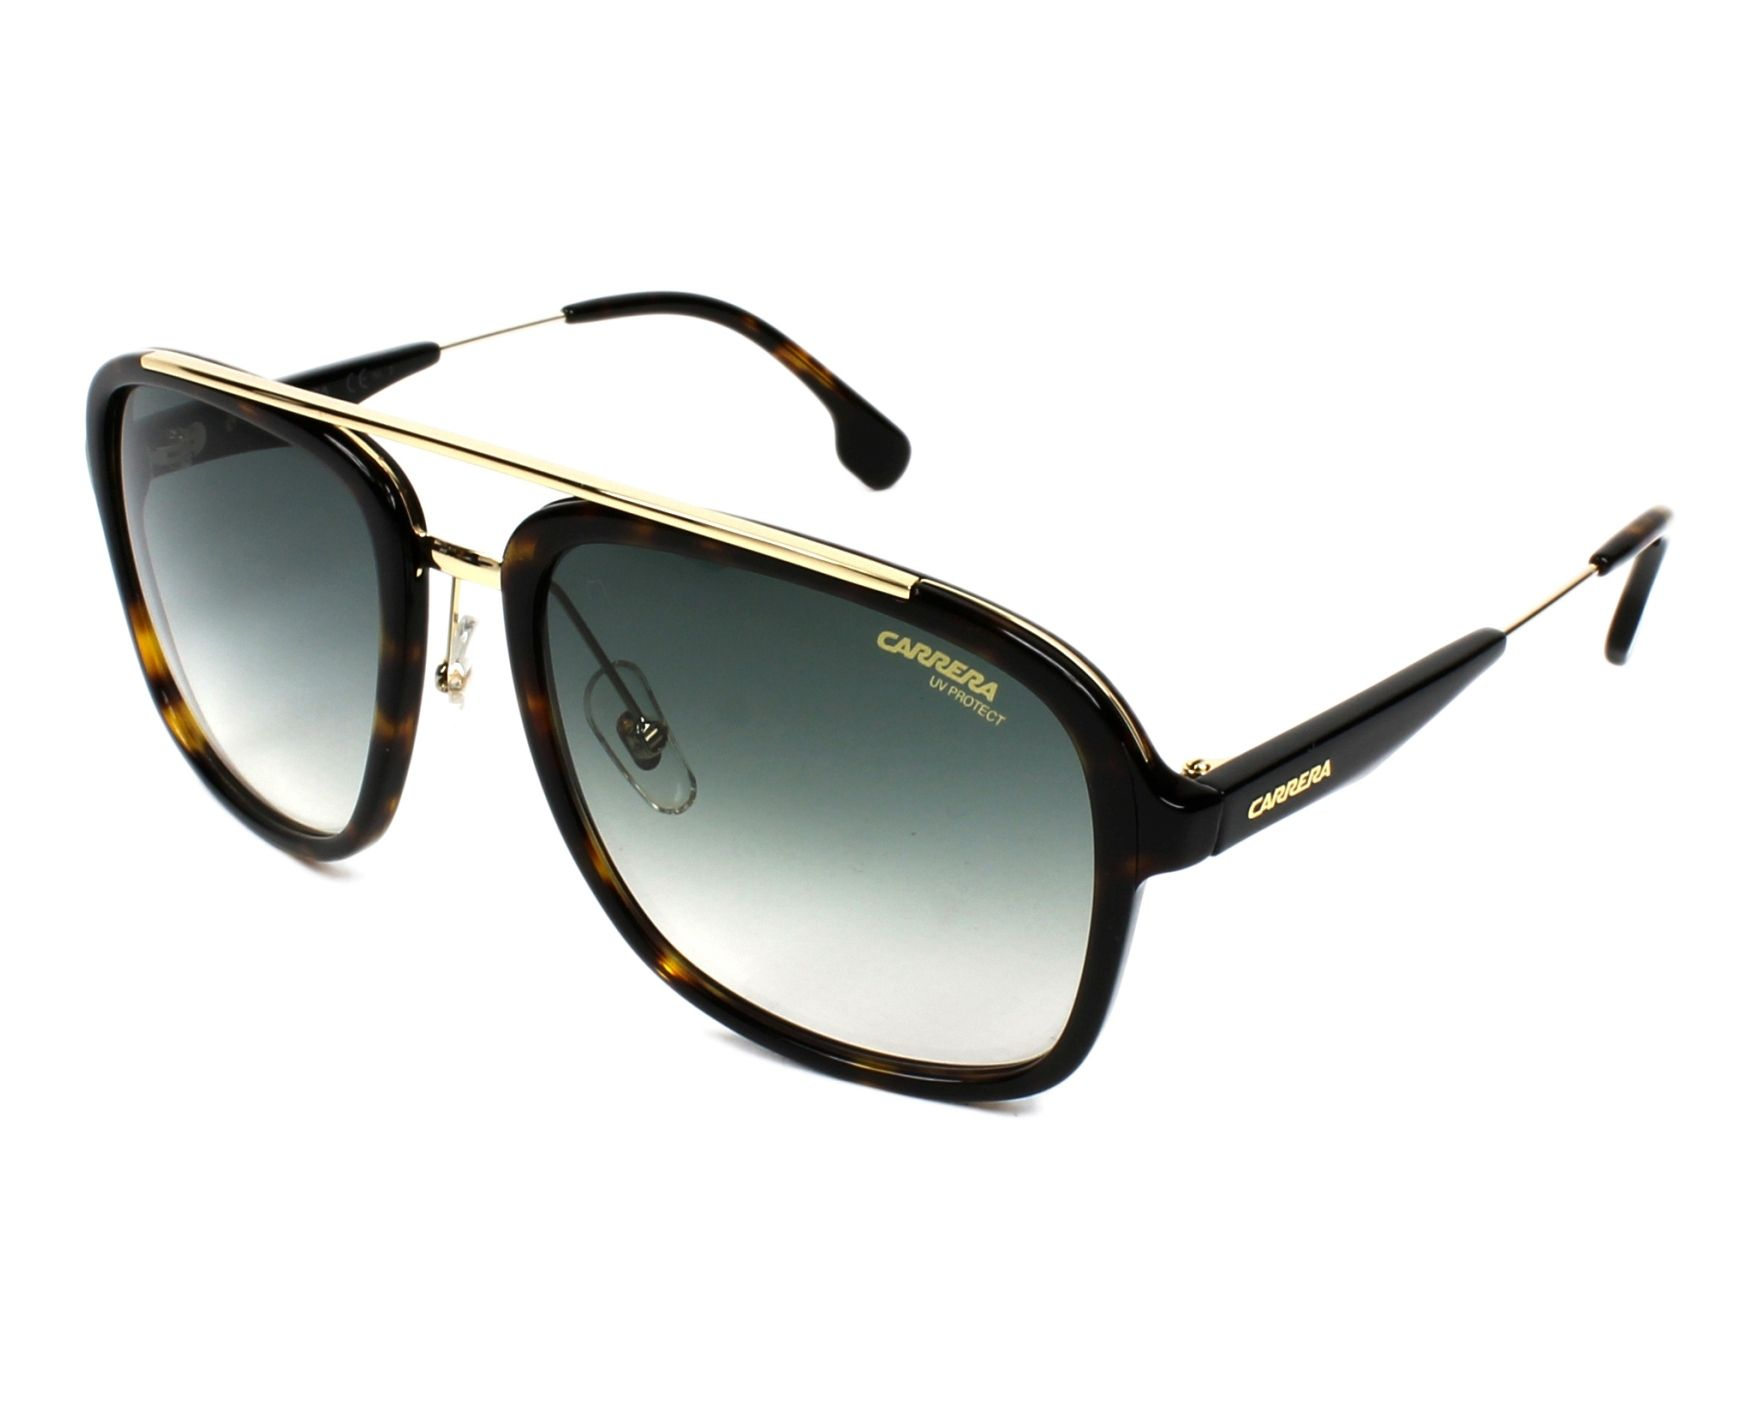 Carrera Sunglasses CARRERA-133-S 2IK/9K Havana